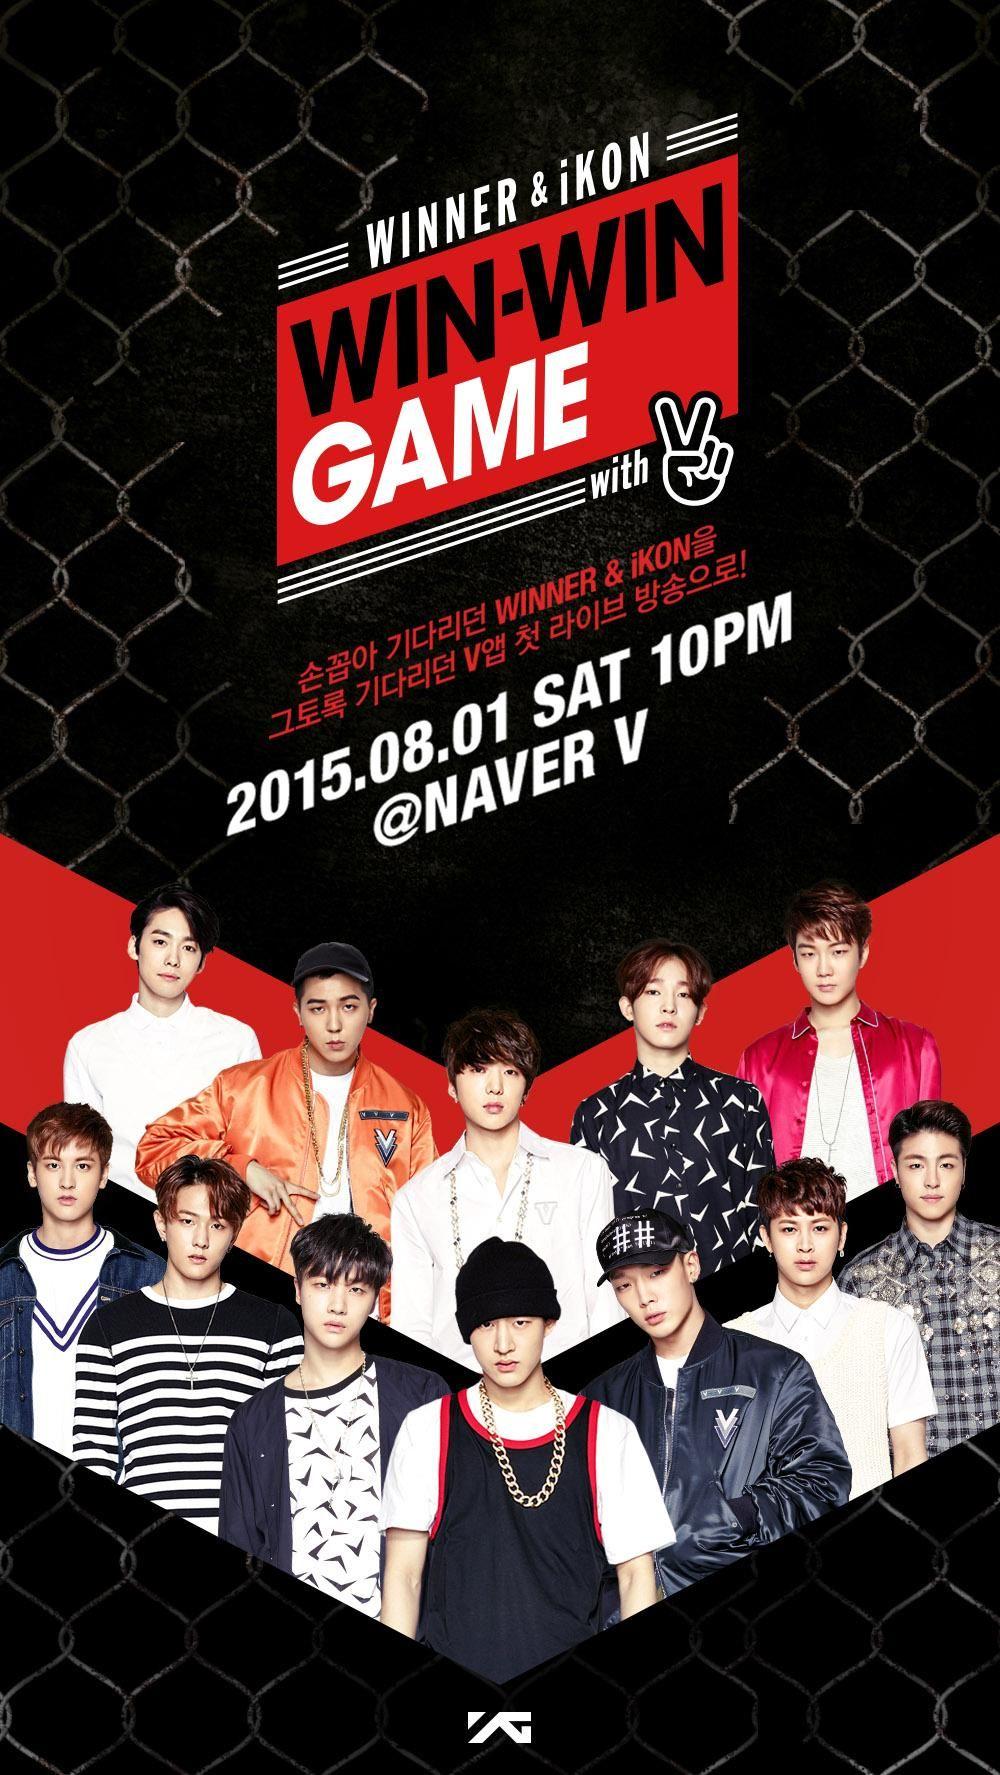 [WINNER & iKON - FIRST V LIVE 'WIN-WIN GAME'] originally posted by http://yg-life.com #WINNER #위너 #iKON #아이콘